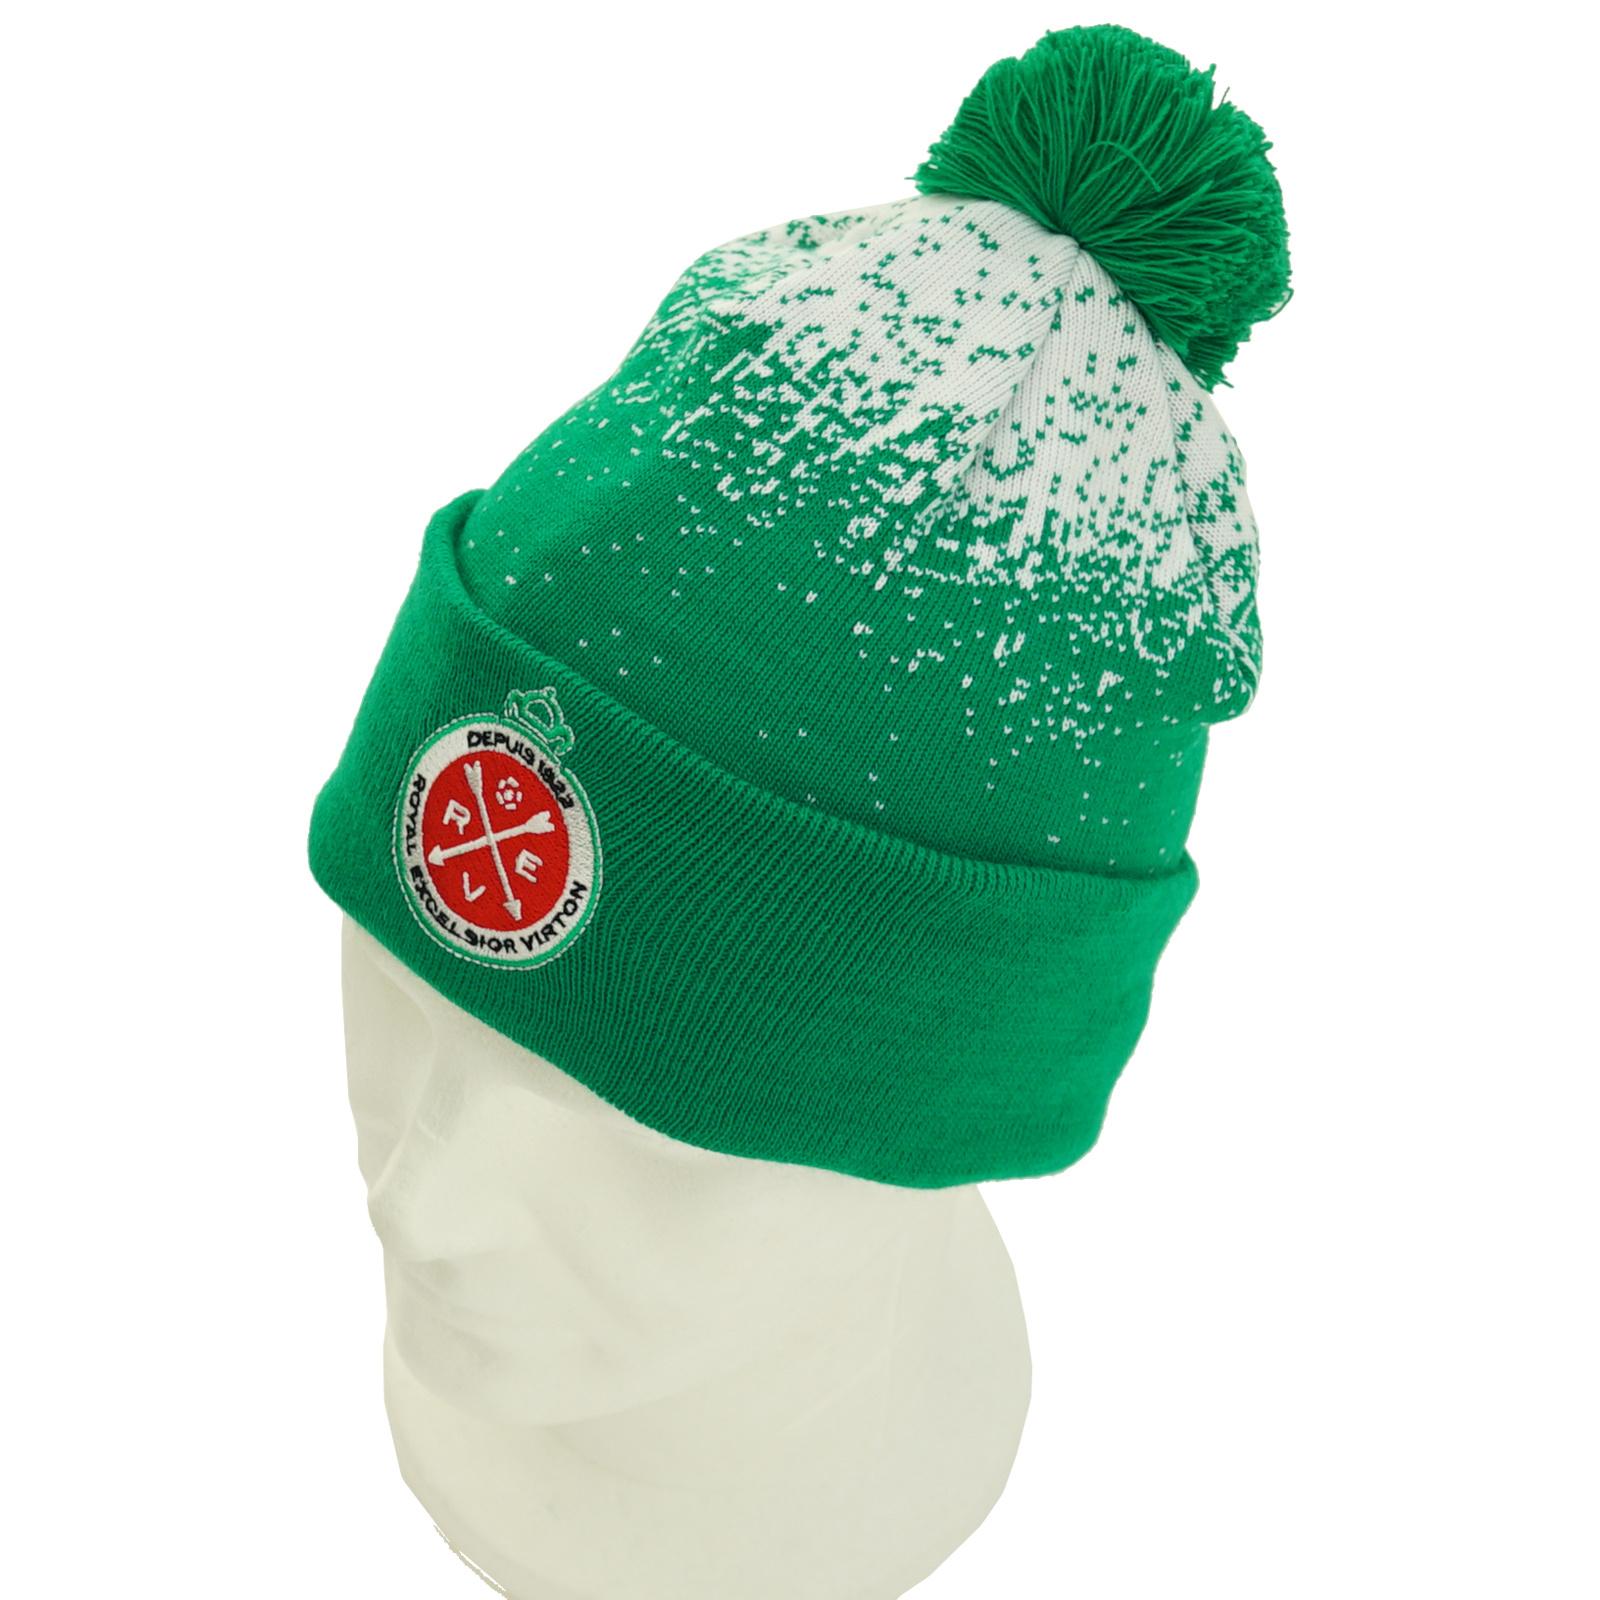 Beanie winter green-white